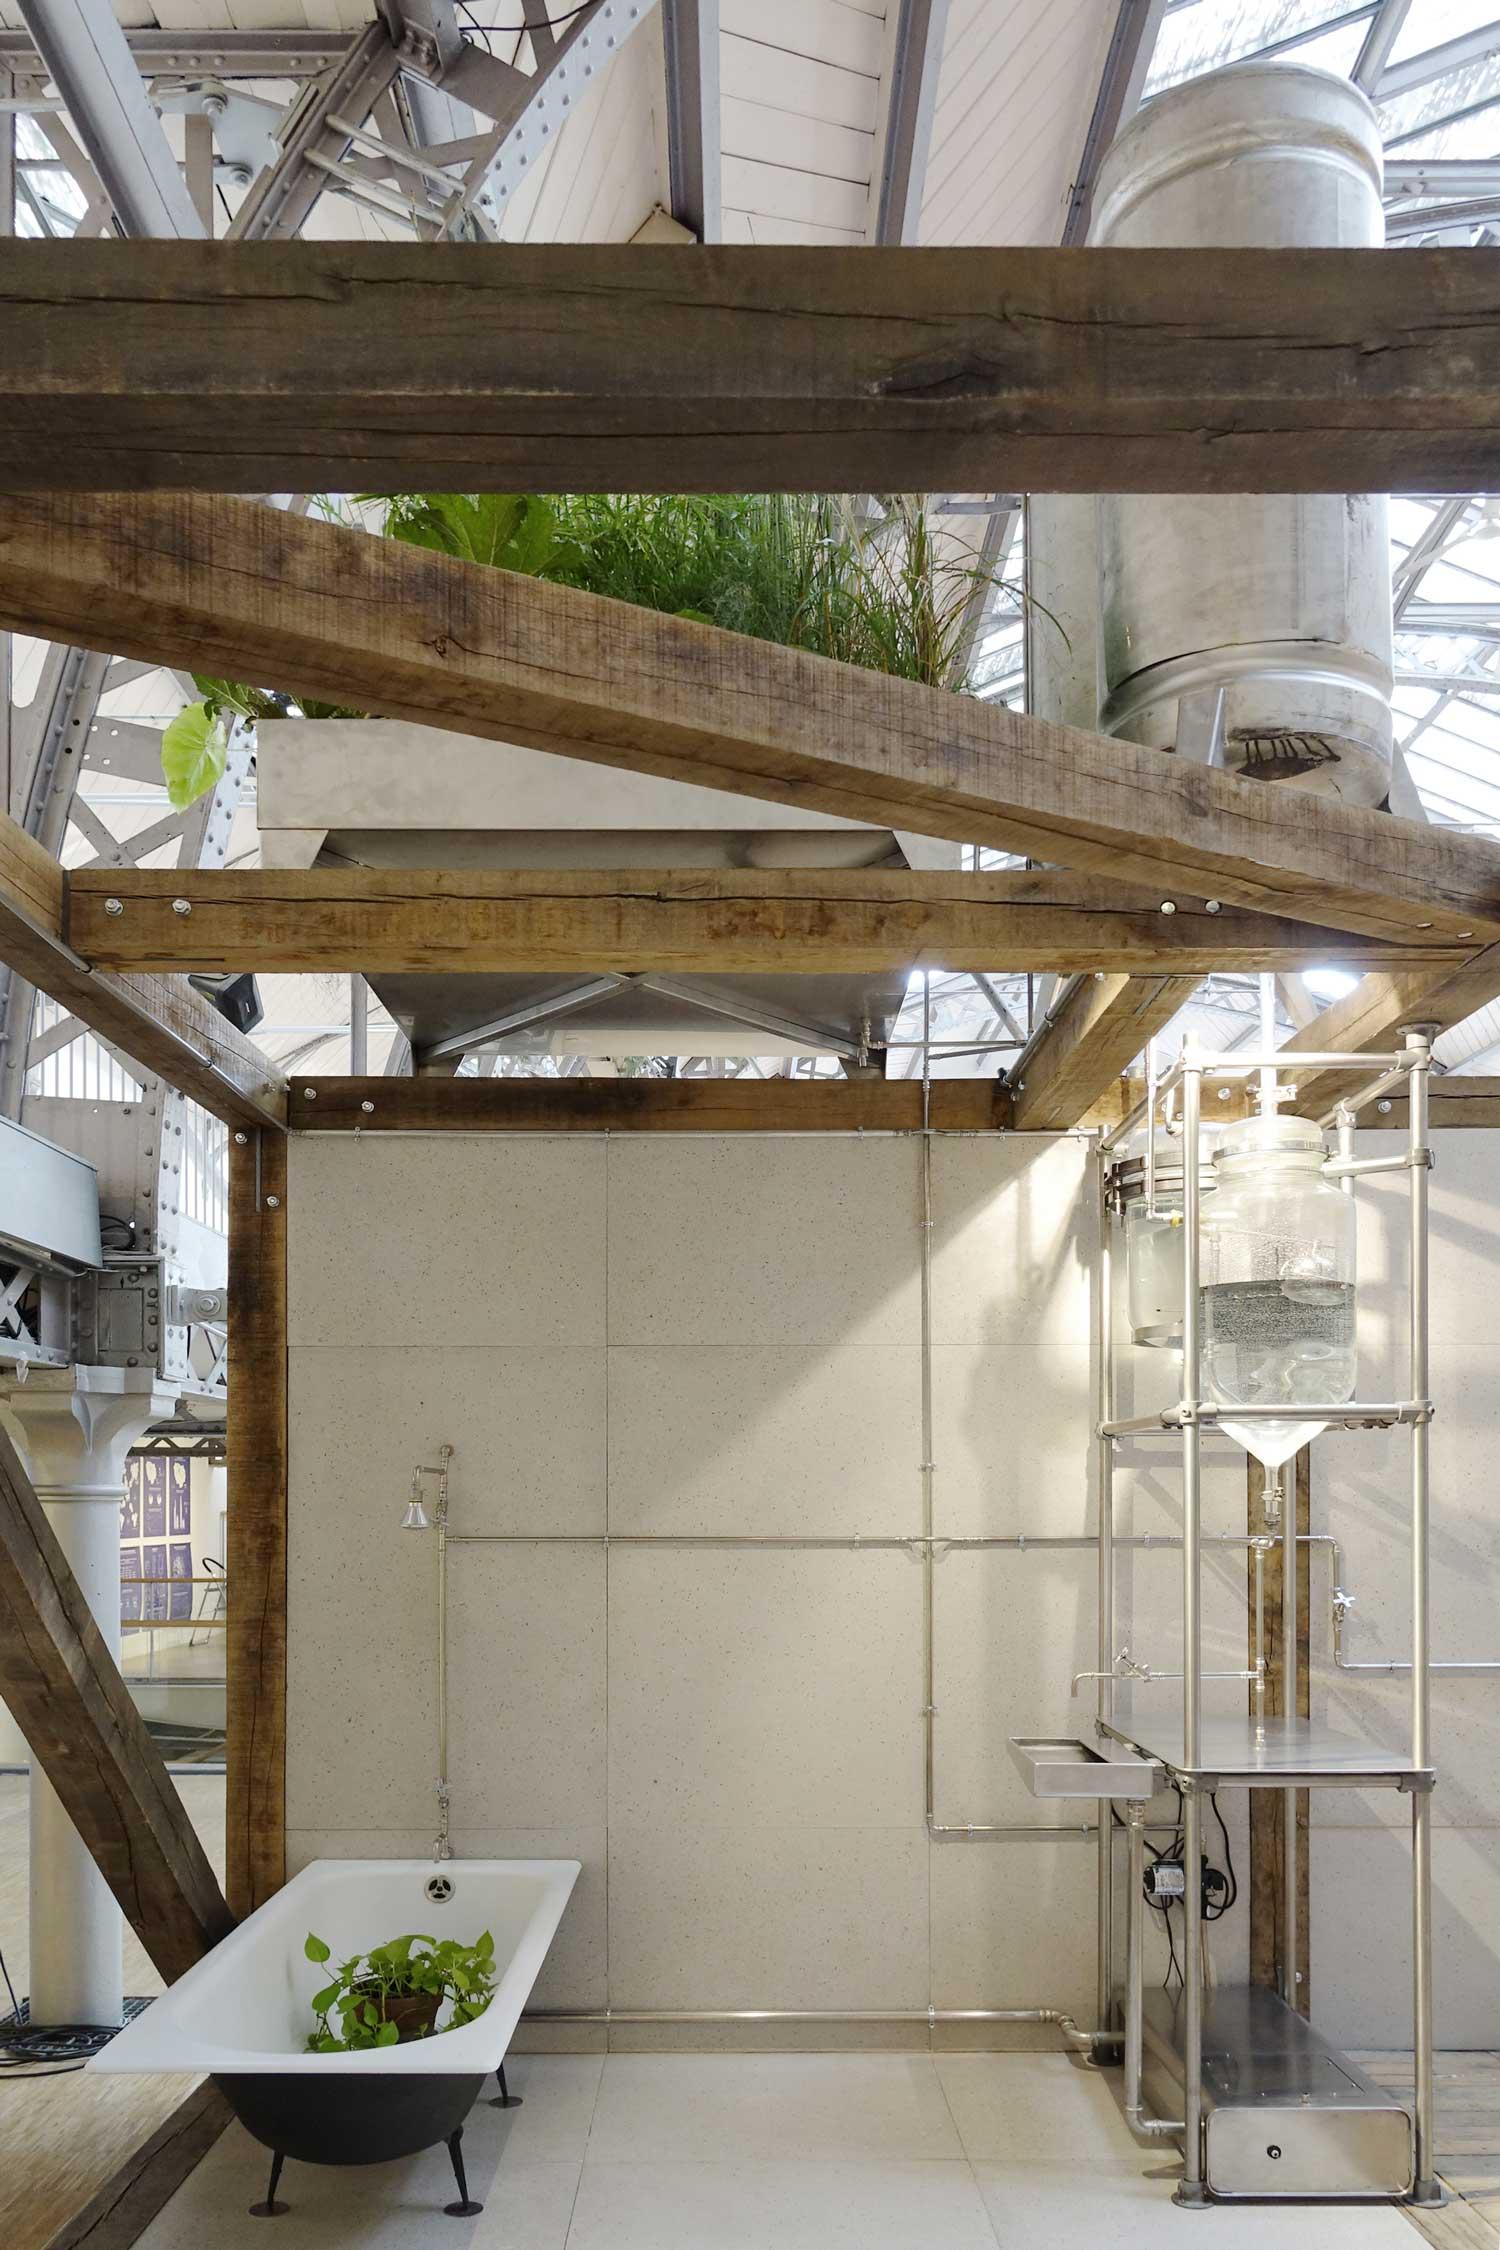 Hôtel Métropole A Room For Tomorrow Prototype by Ciguë.